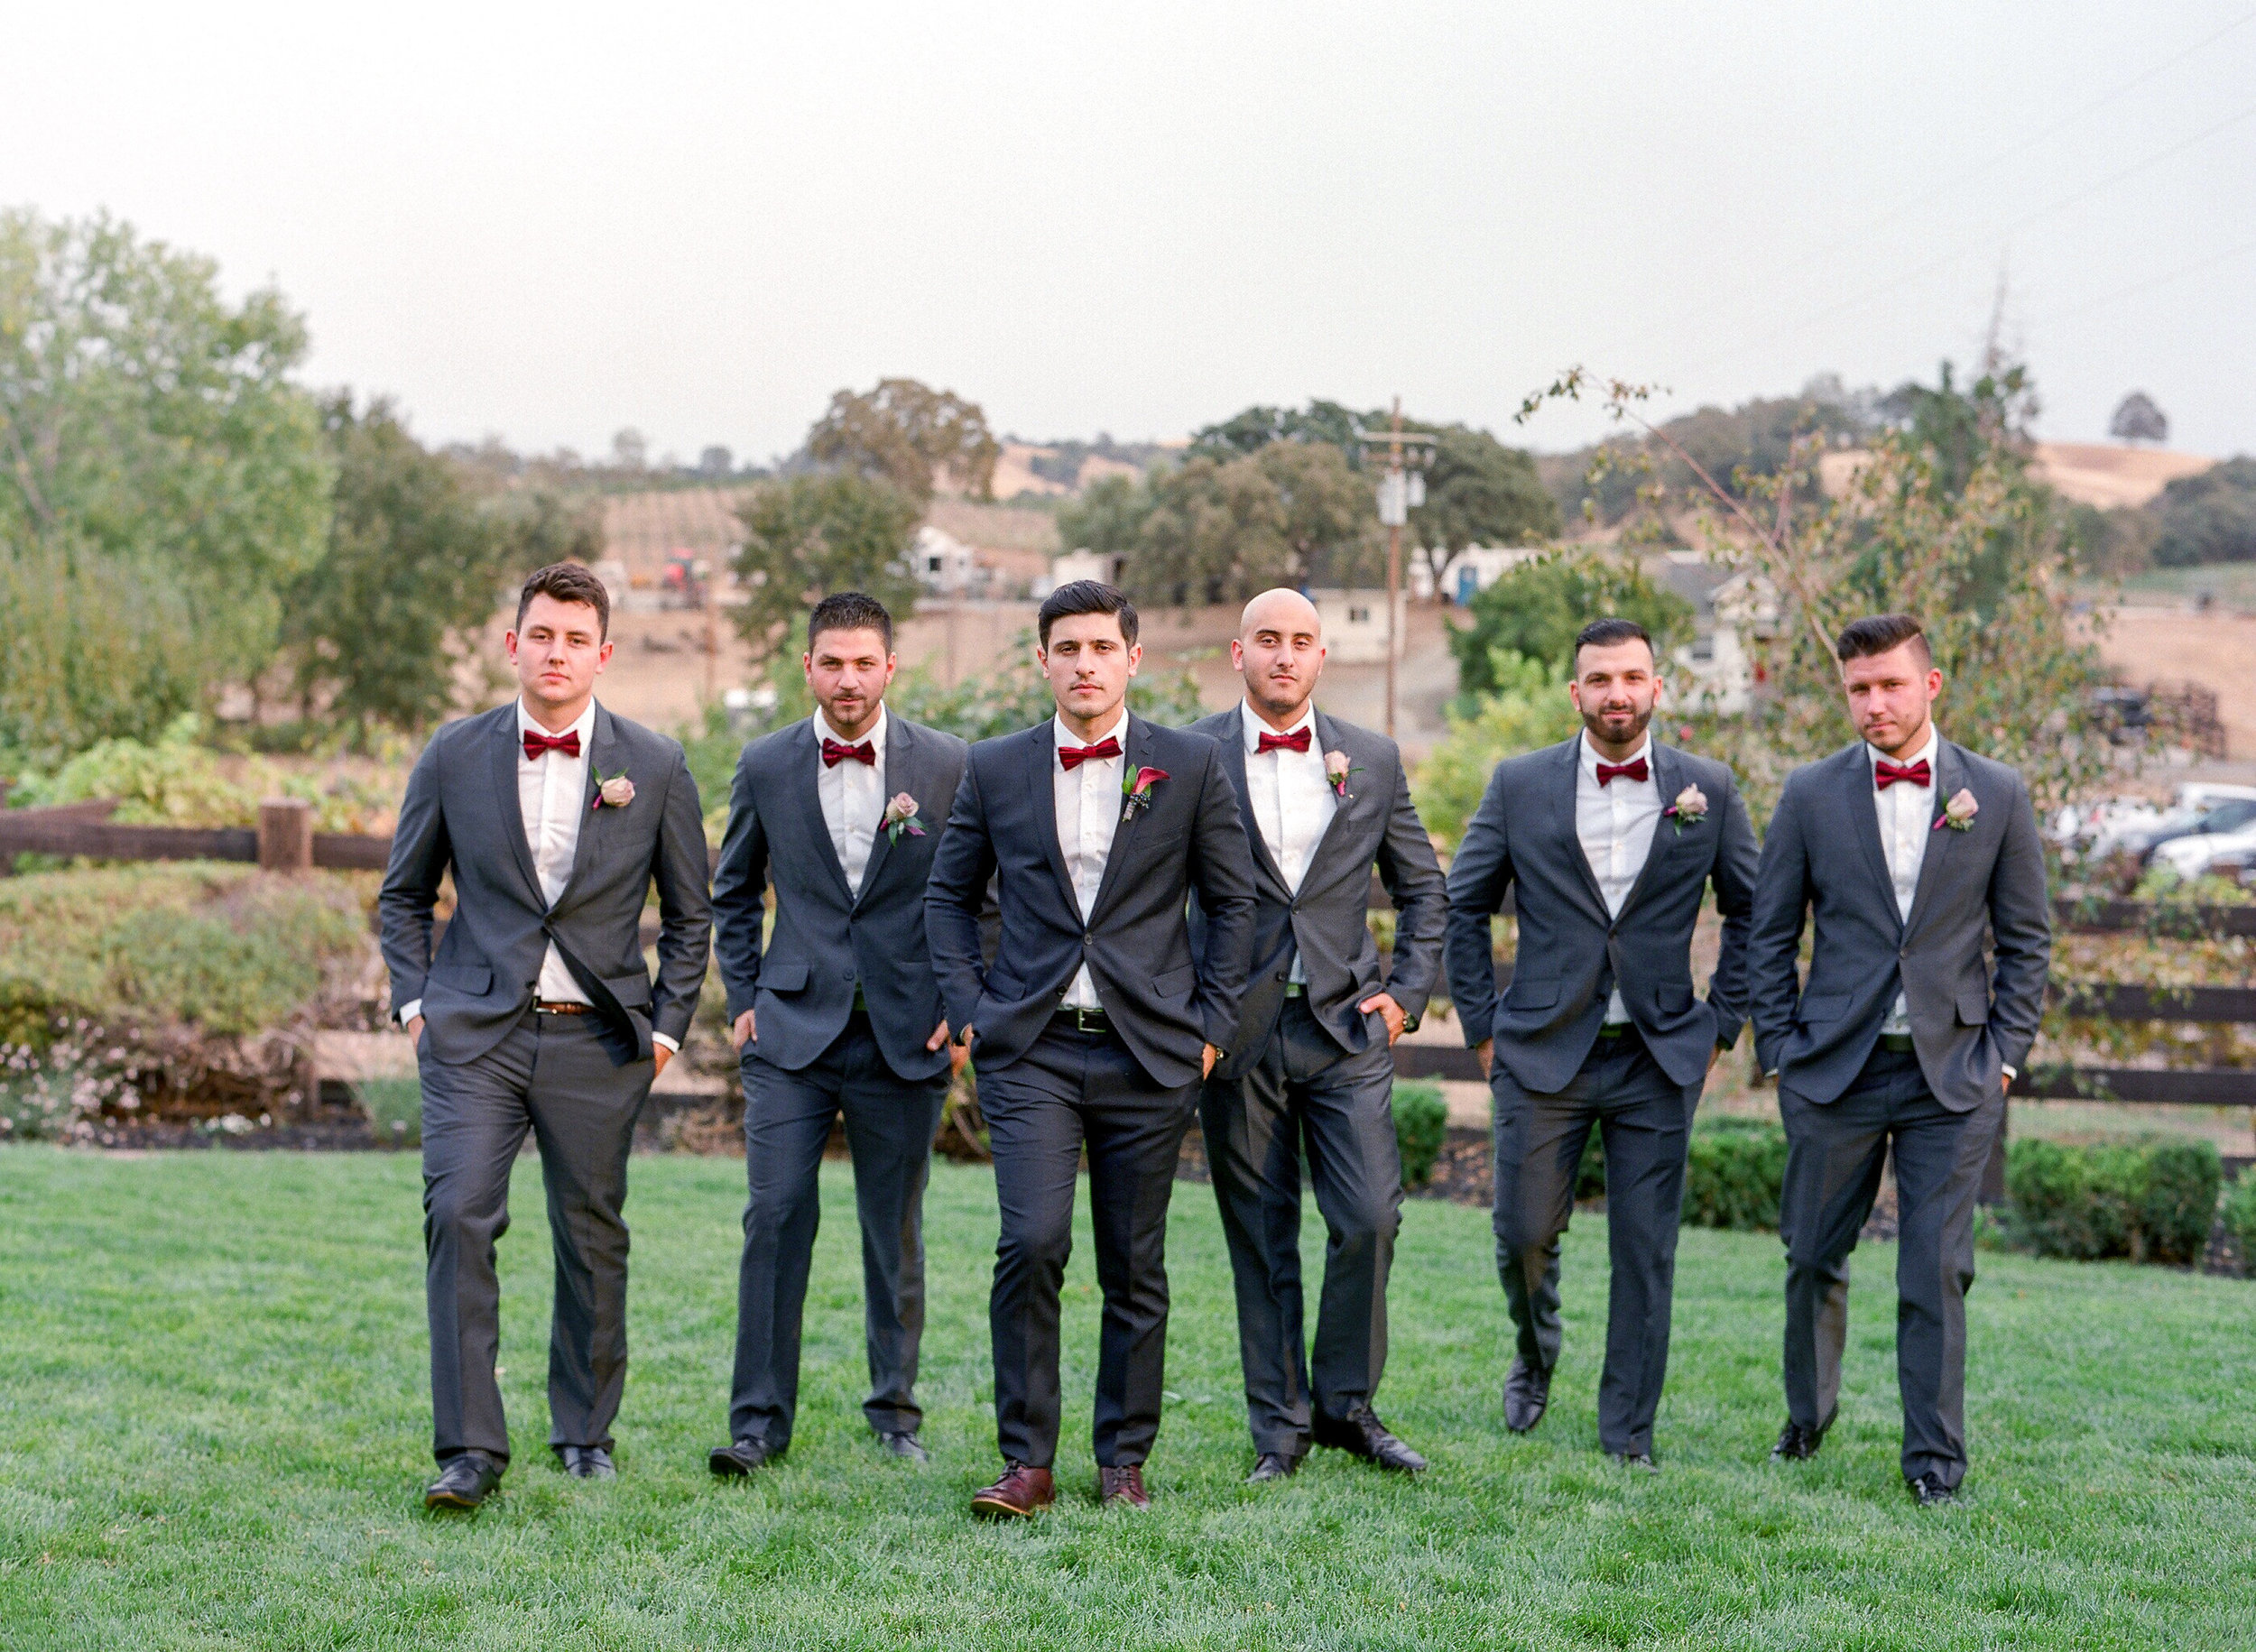 Amador_County_Wedding_Groom_Groomsmen_Boutonnieres_Rancho_Victoria_Vineyard_Northern_California.jpg